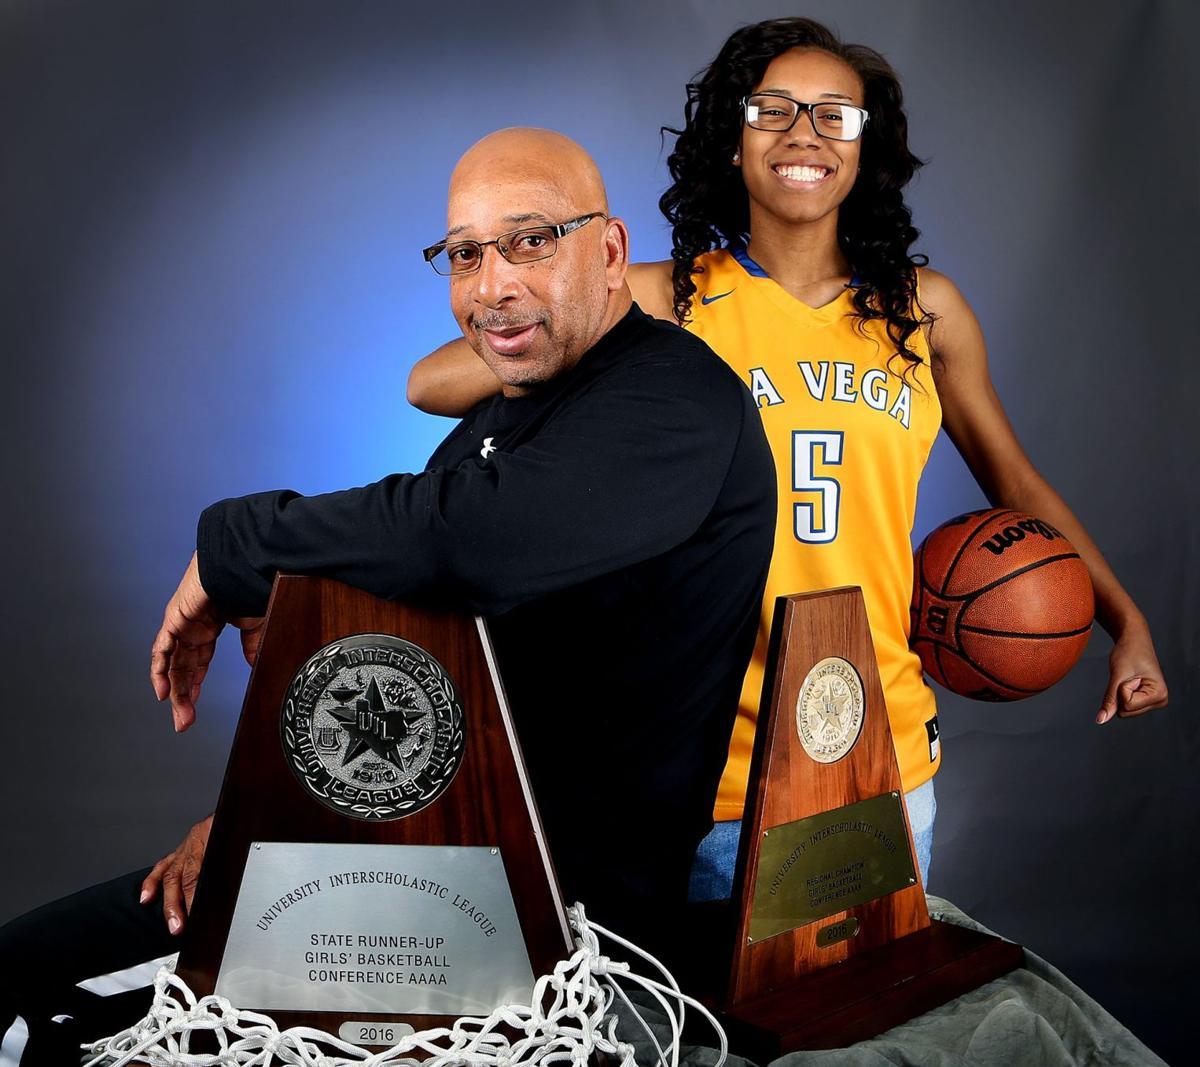 Super Centex Girls Basketball Team La Vegas Landrum Jefferson Formed Elite Partnership